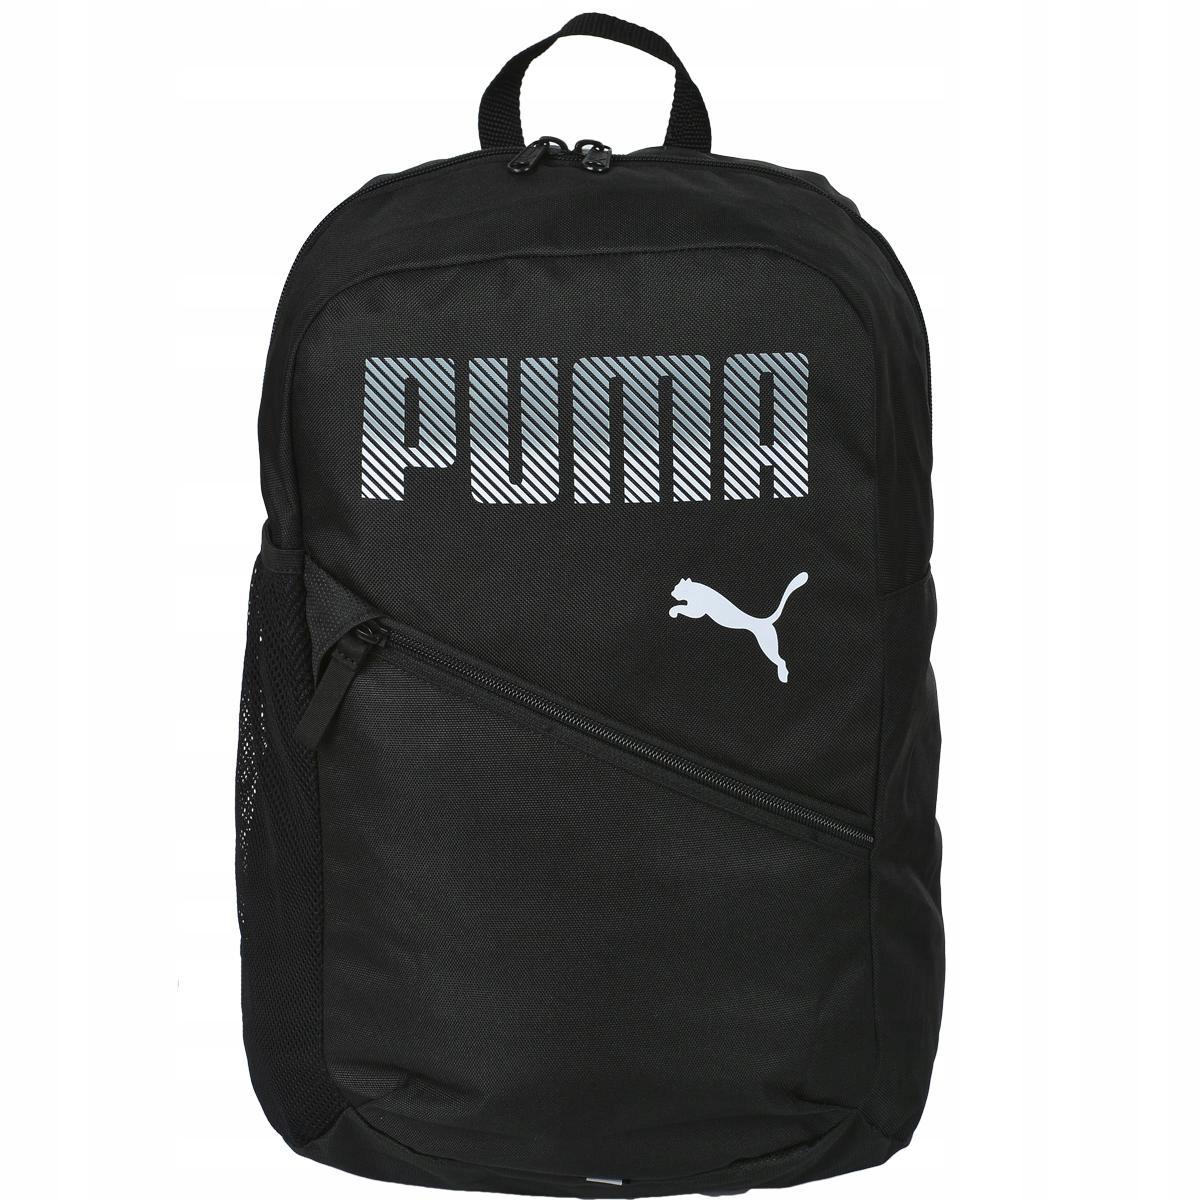 e1a8f0a418e85 Plecak PUMA Szkolny Sportowy (075483-01) B-R - 7509922314 ...